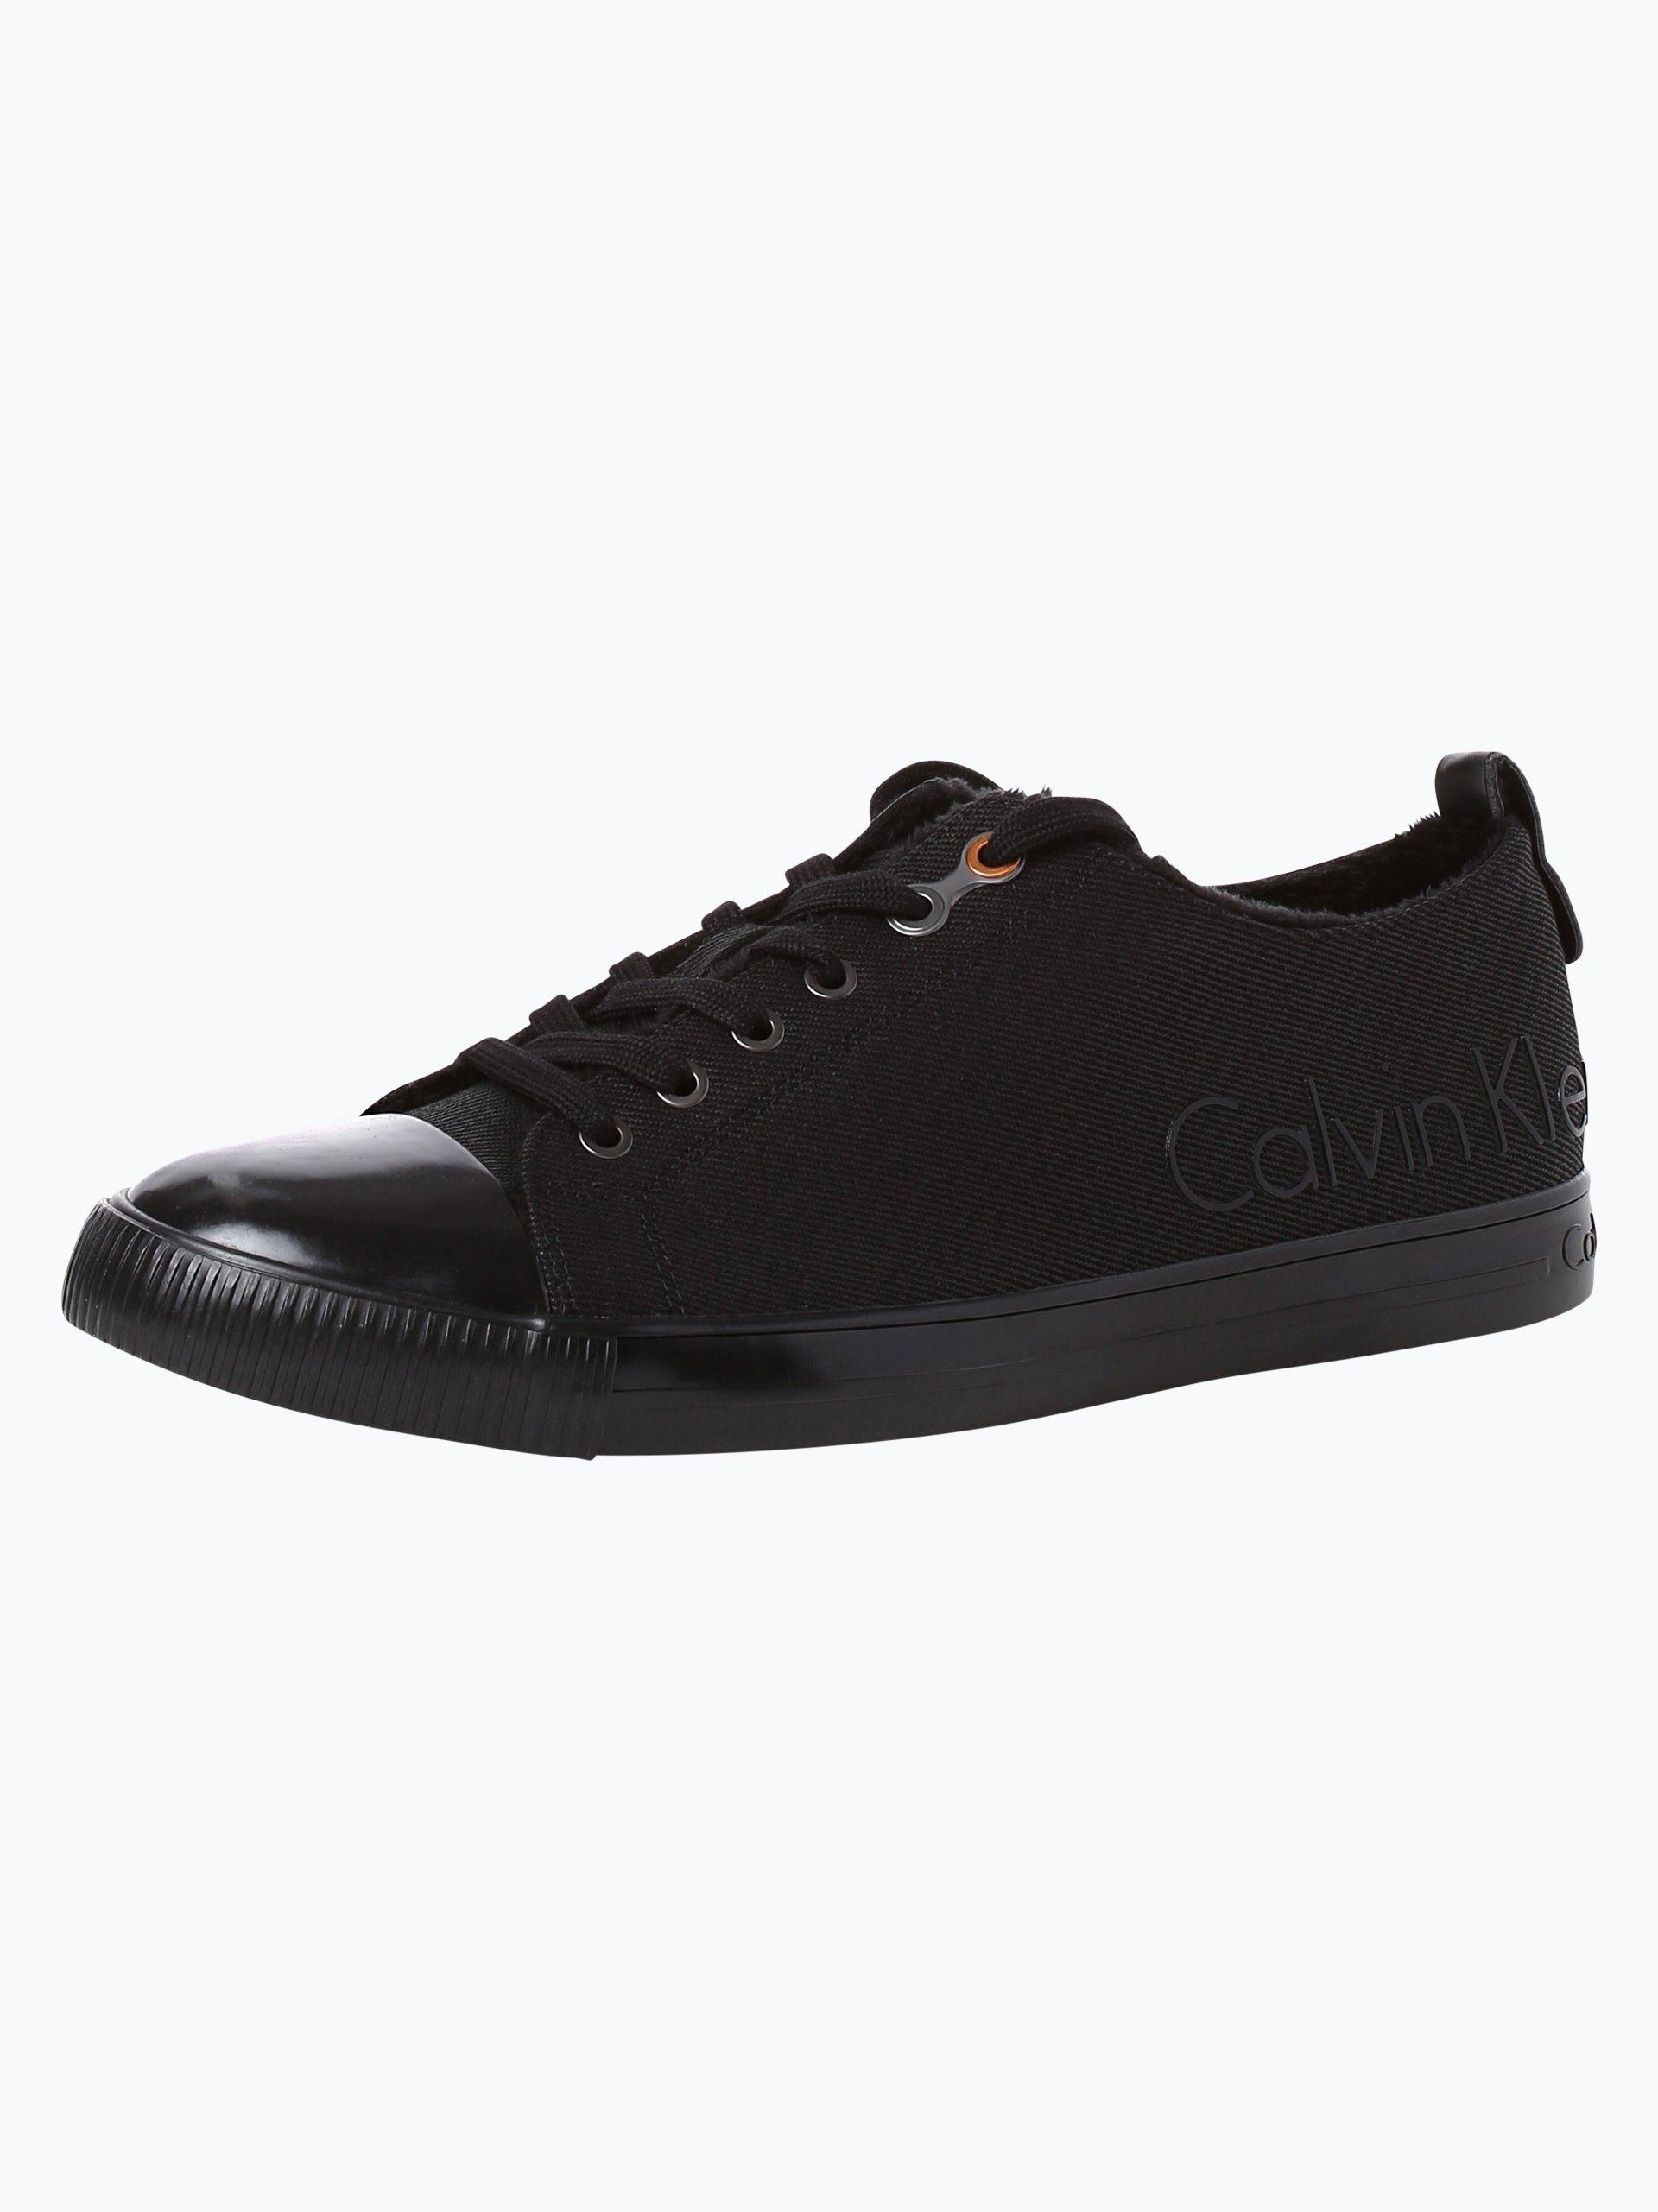 calvin klein jeans herren sneaker arturo schwarz uni. Black Bedroom Furniture Sets. Home Design Ideas